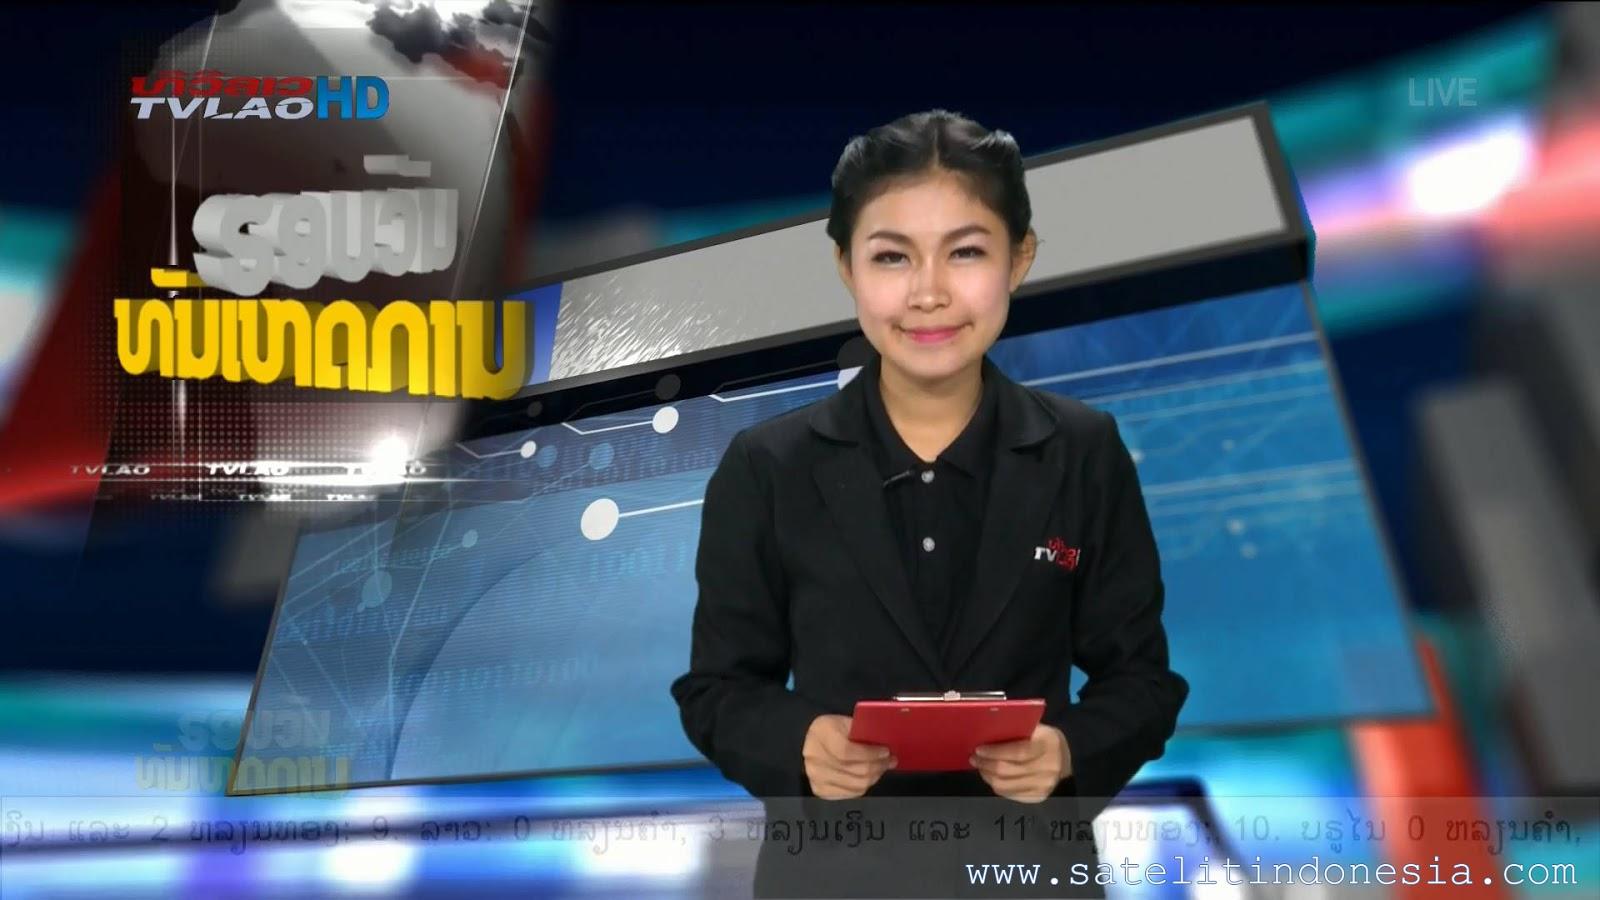 Frekuensi siaran TVLAO HD di satelit Thaicom 5 Terbaru